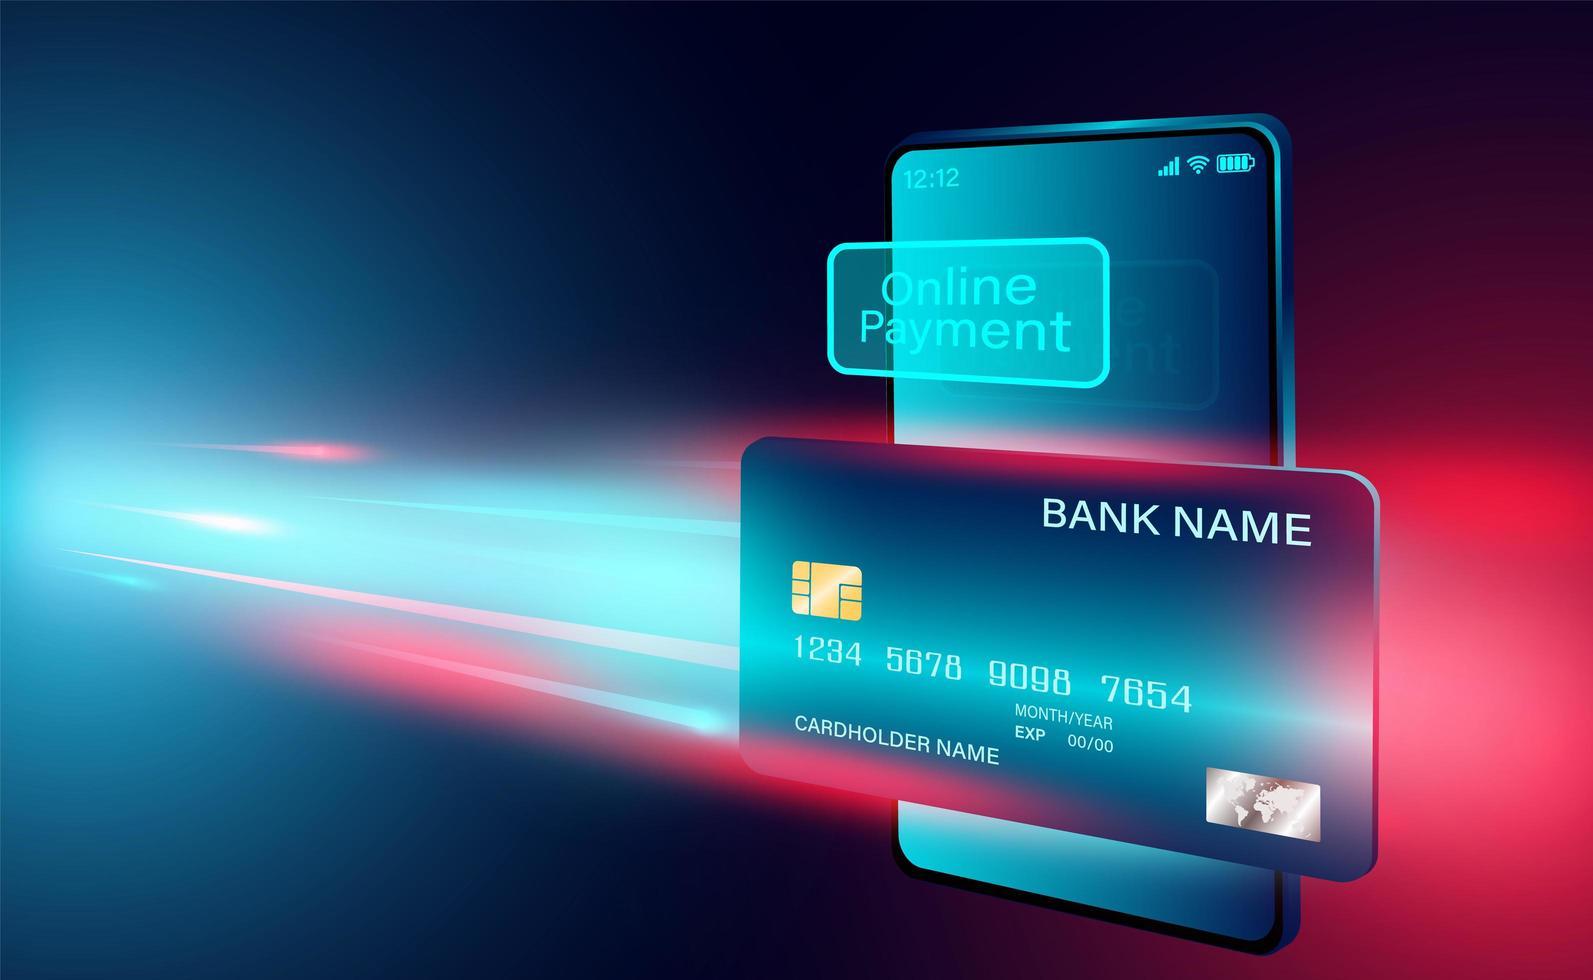 kreditkort online betalning koncept banner vektor